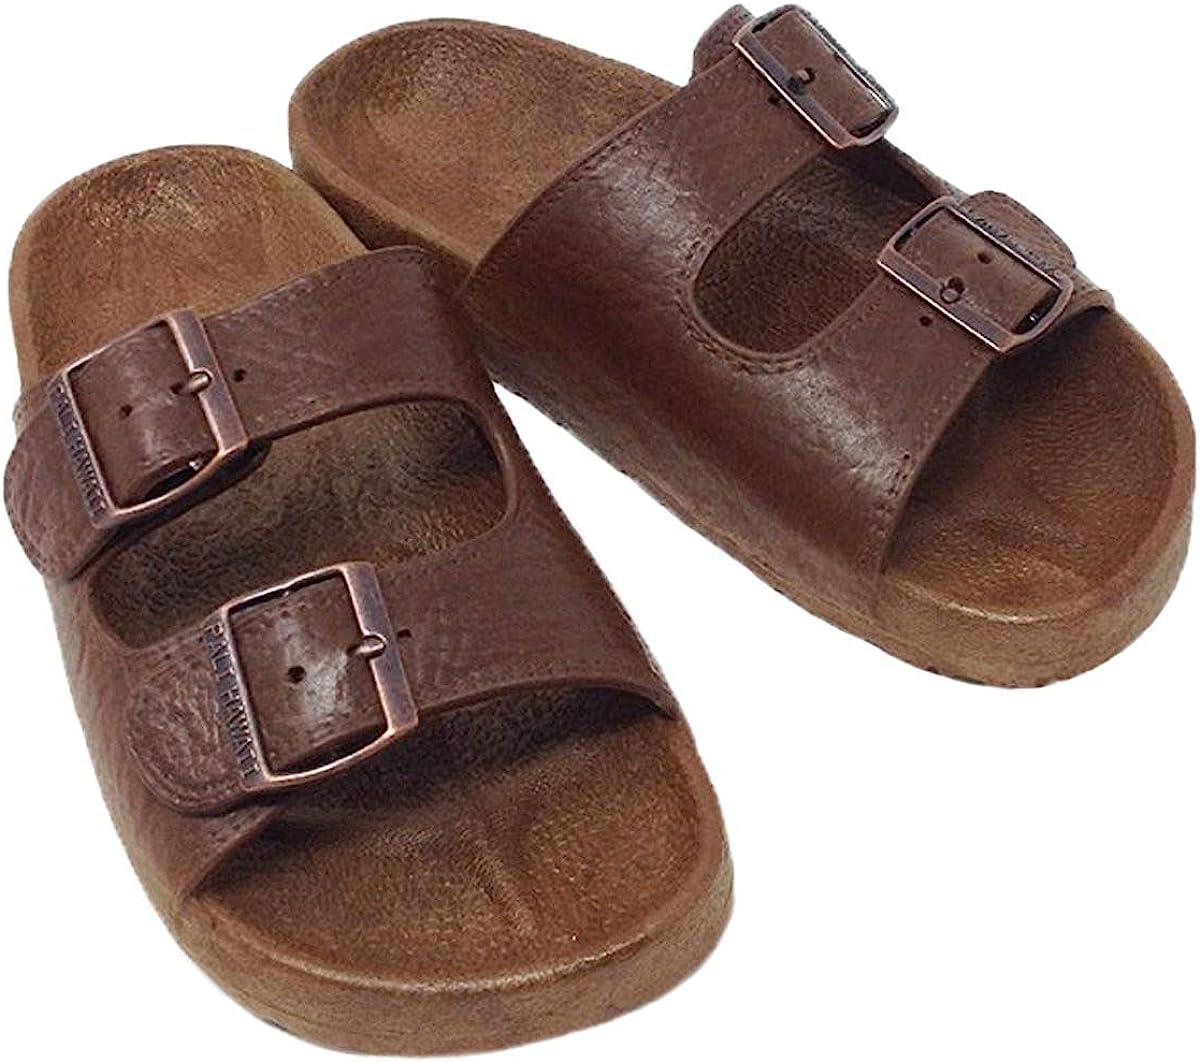 Pali Hawaii Jesus Buckle Sandal